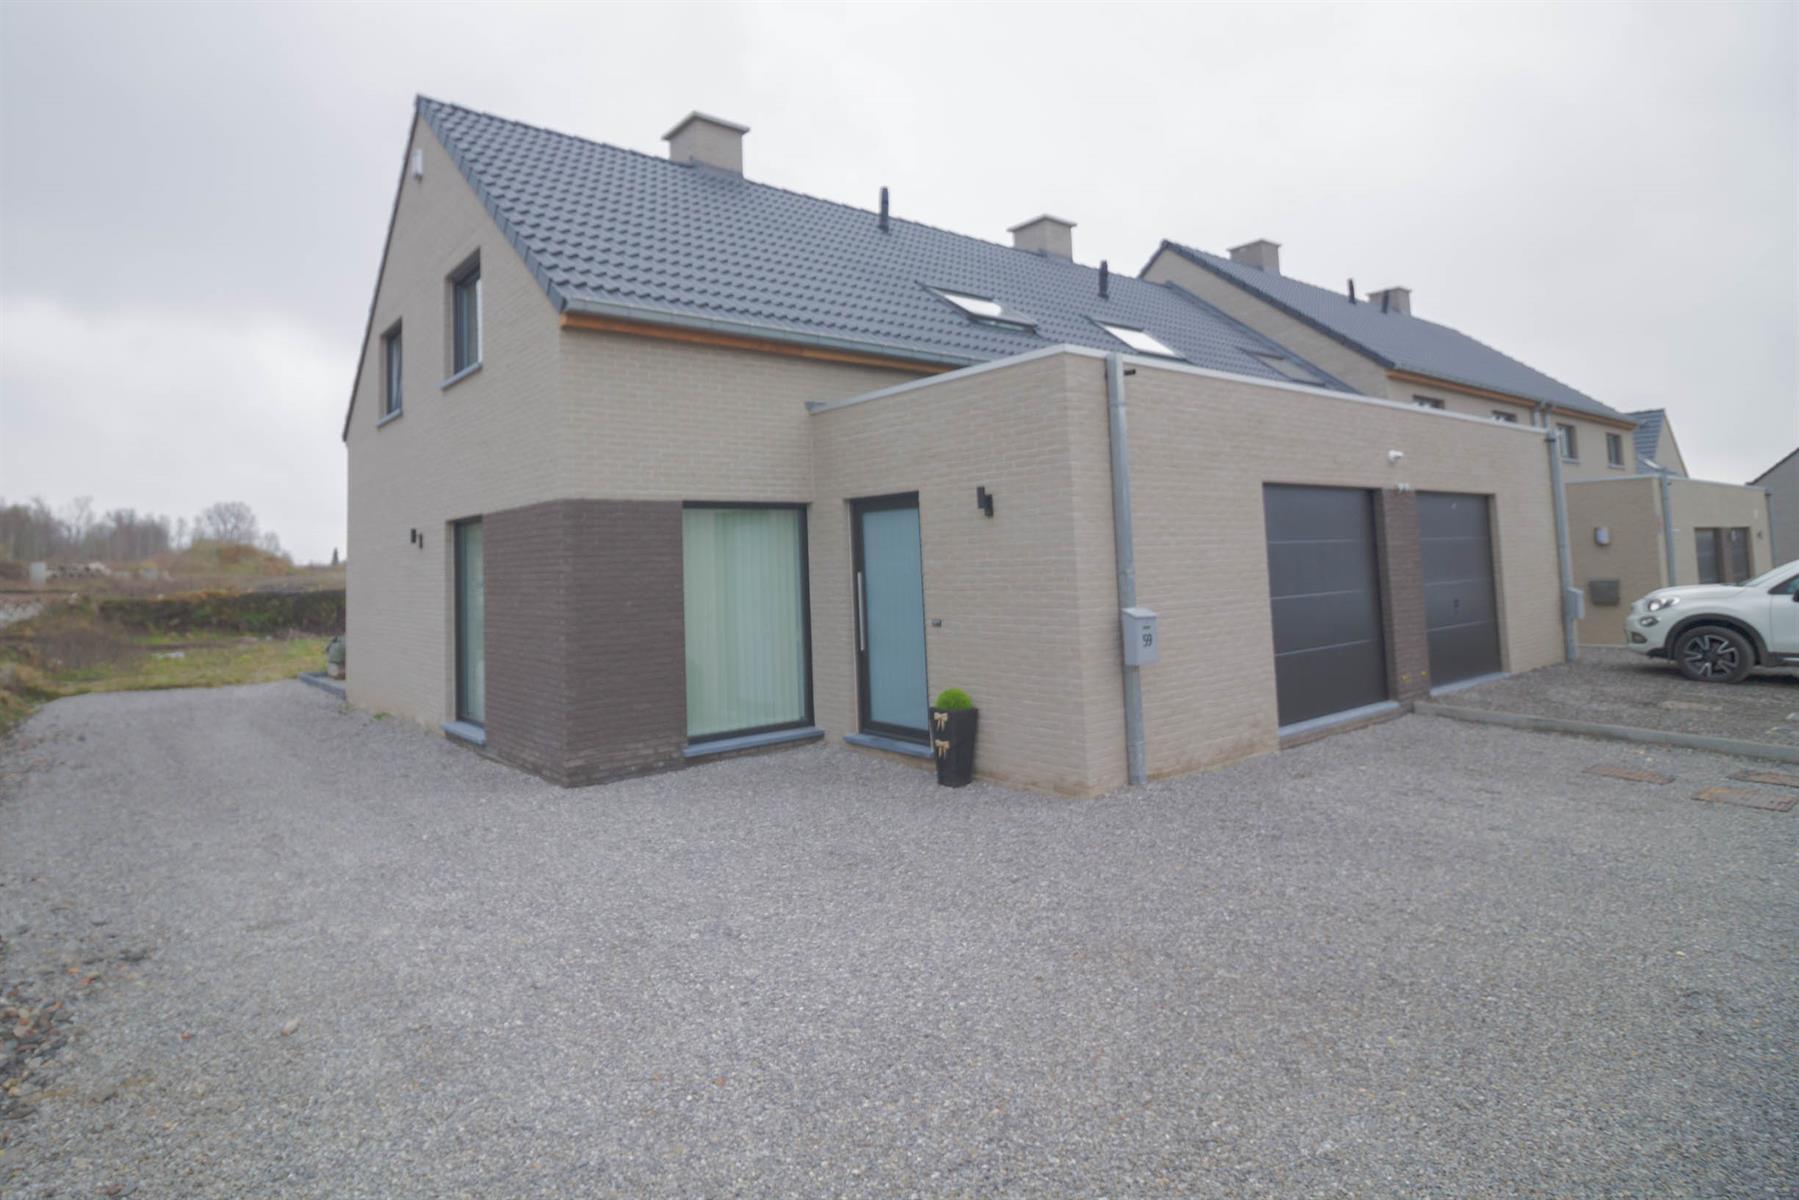 Maison - Maurage - #4321123-22